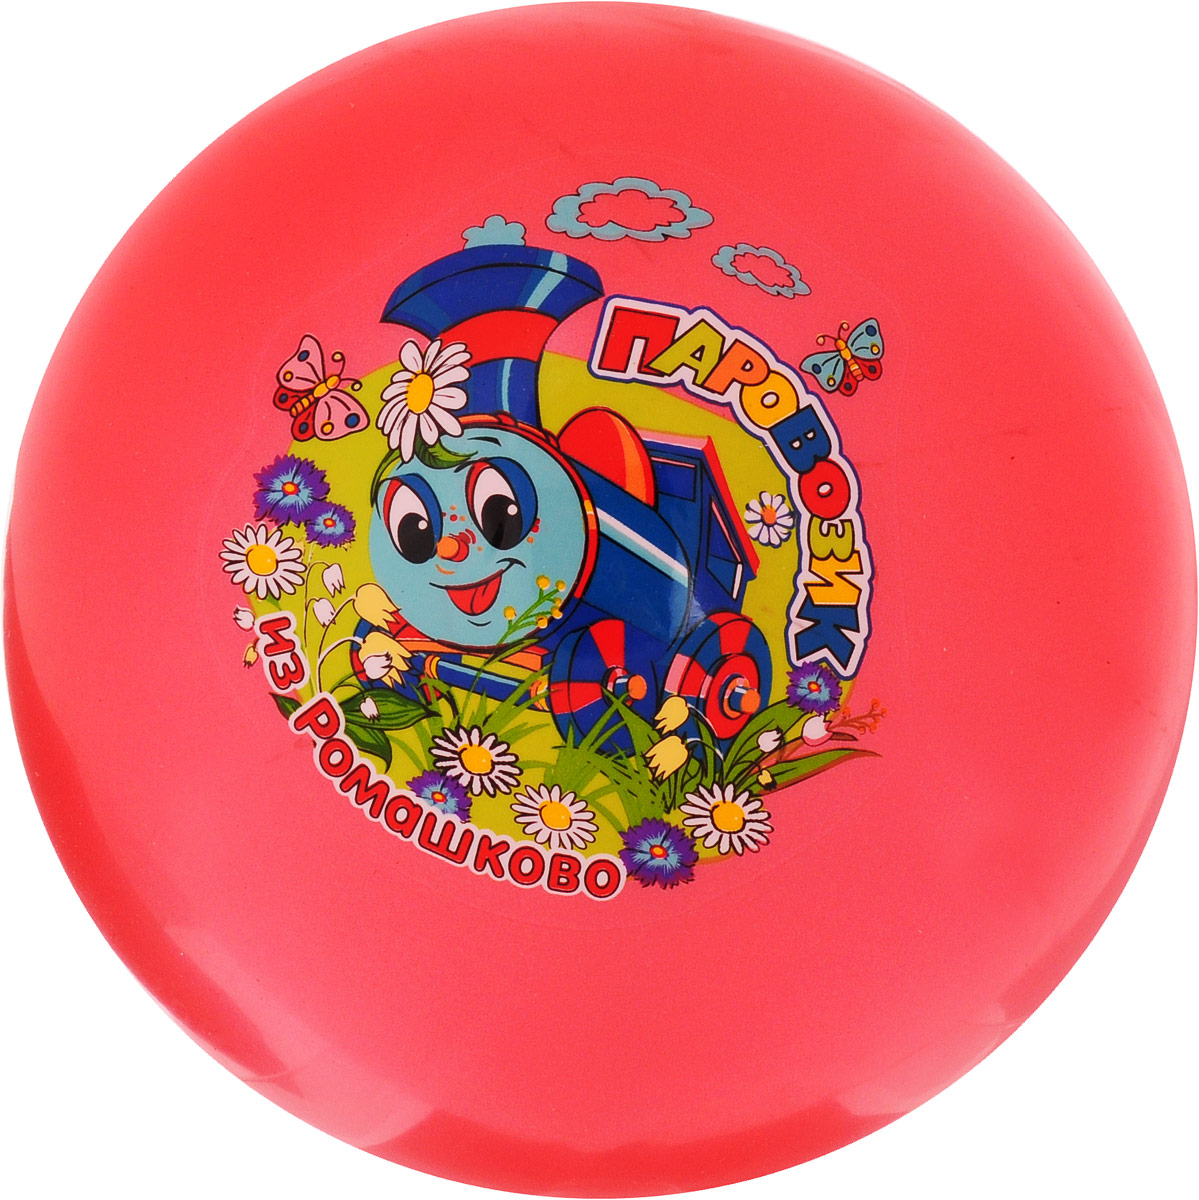 Играем вместе Мяч Паровозик из Ромашково цвет красный 23 см играем вместе мяч русалочка 33 см играем вместе